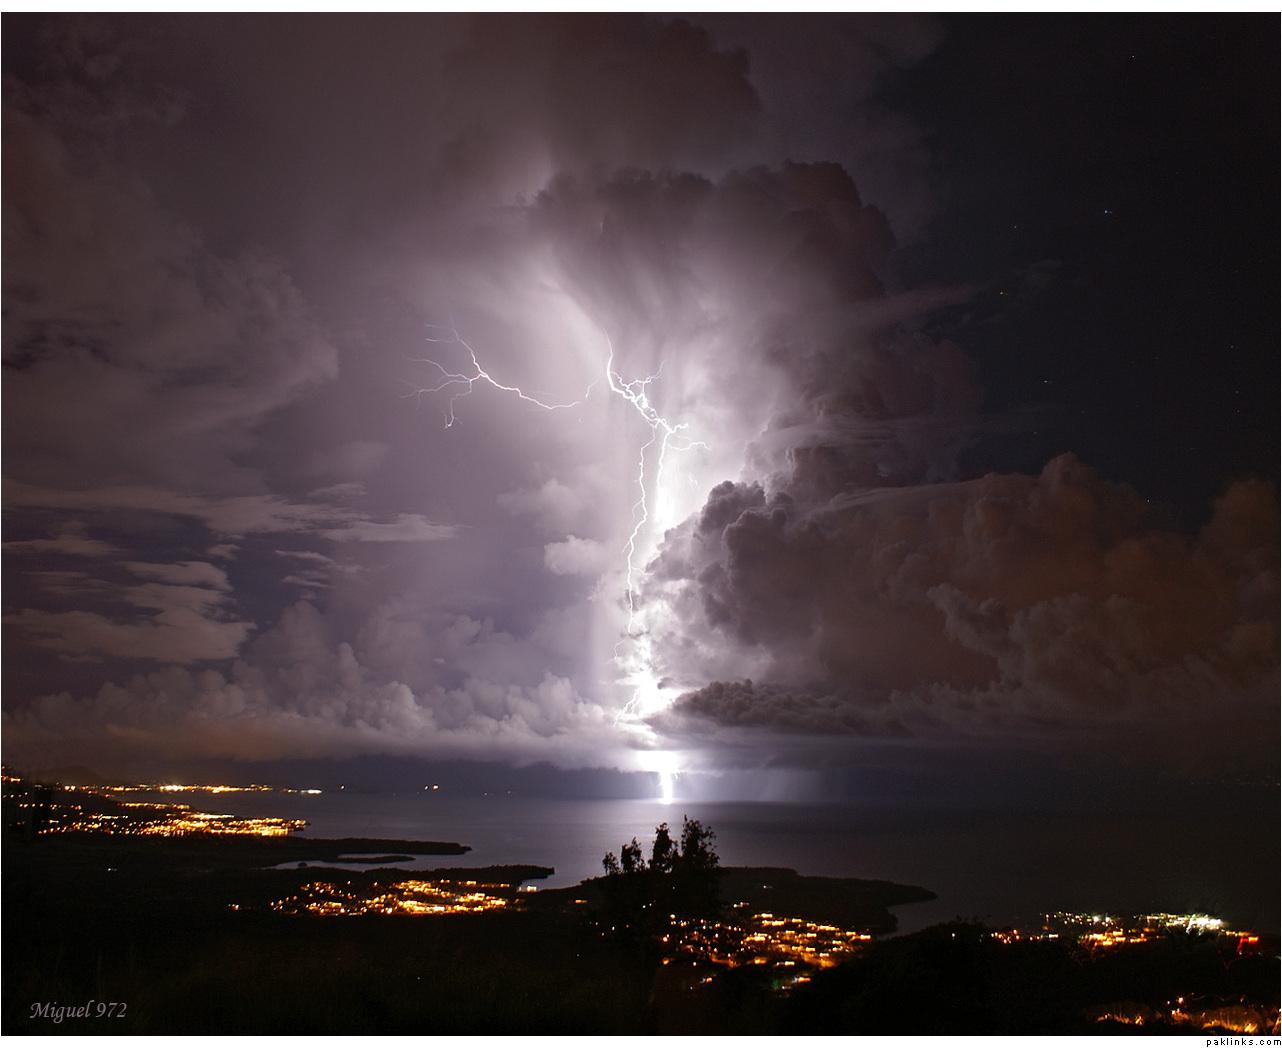 Everlasting Storm Known as Catatumbo Lightning | Annoyz View